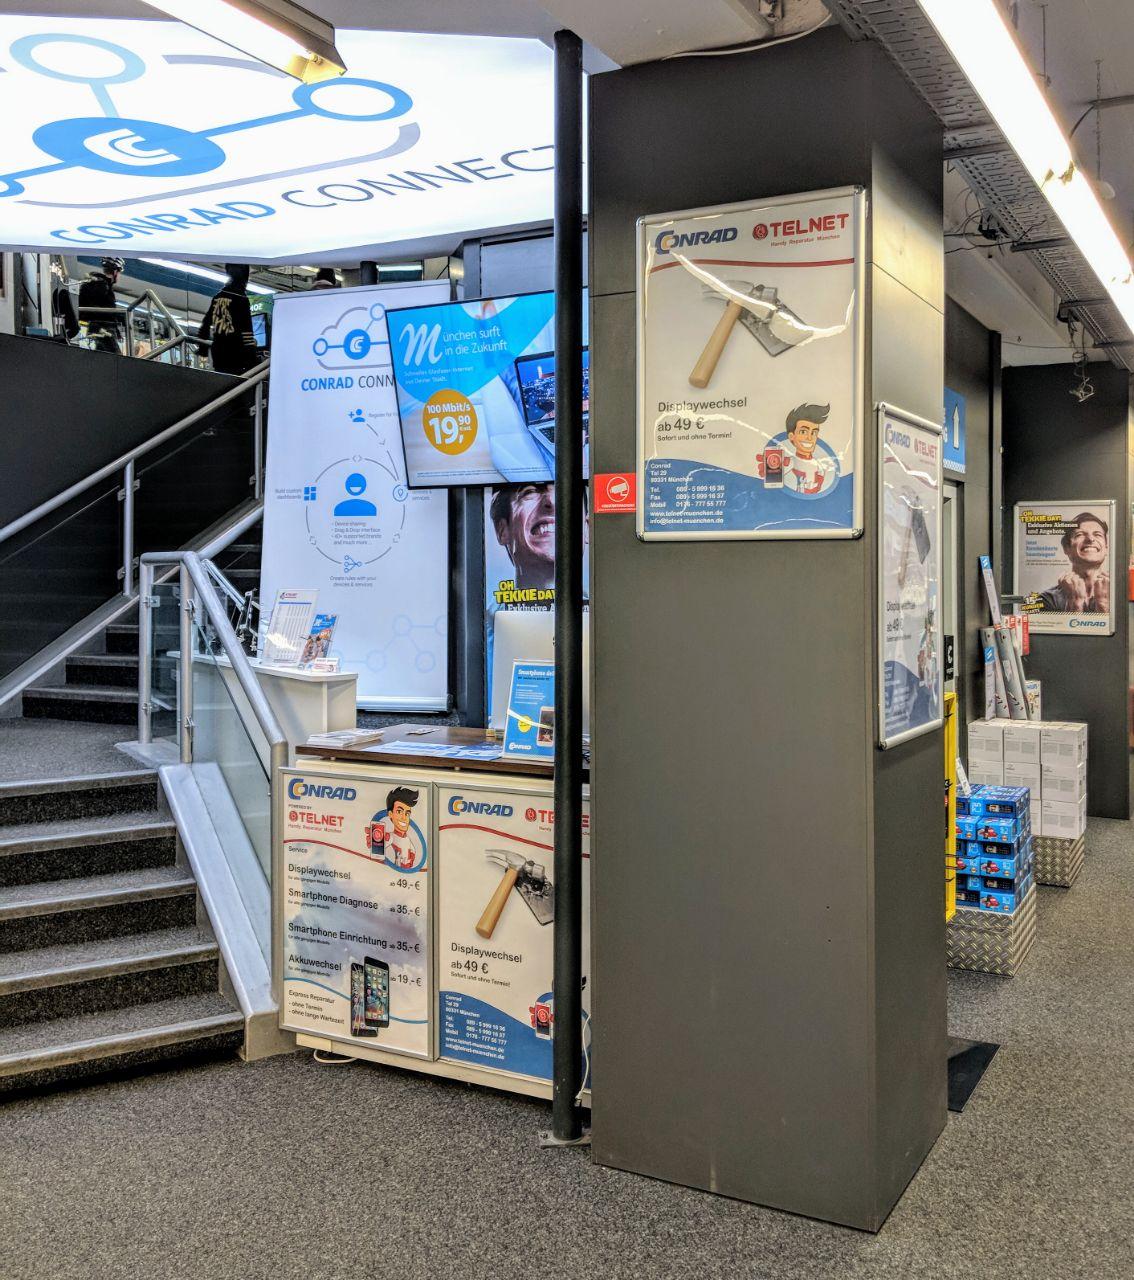 Telnet Handy & iPhone Reparatur nähe Marienplatz im Conrad Electronic Shop